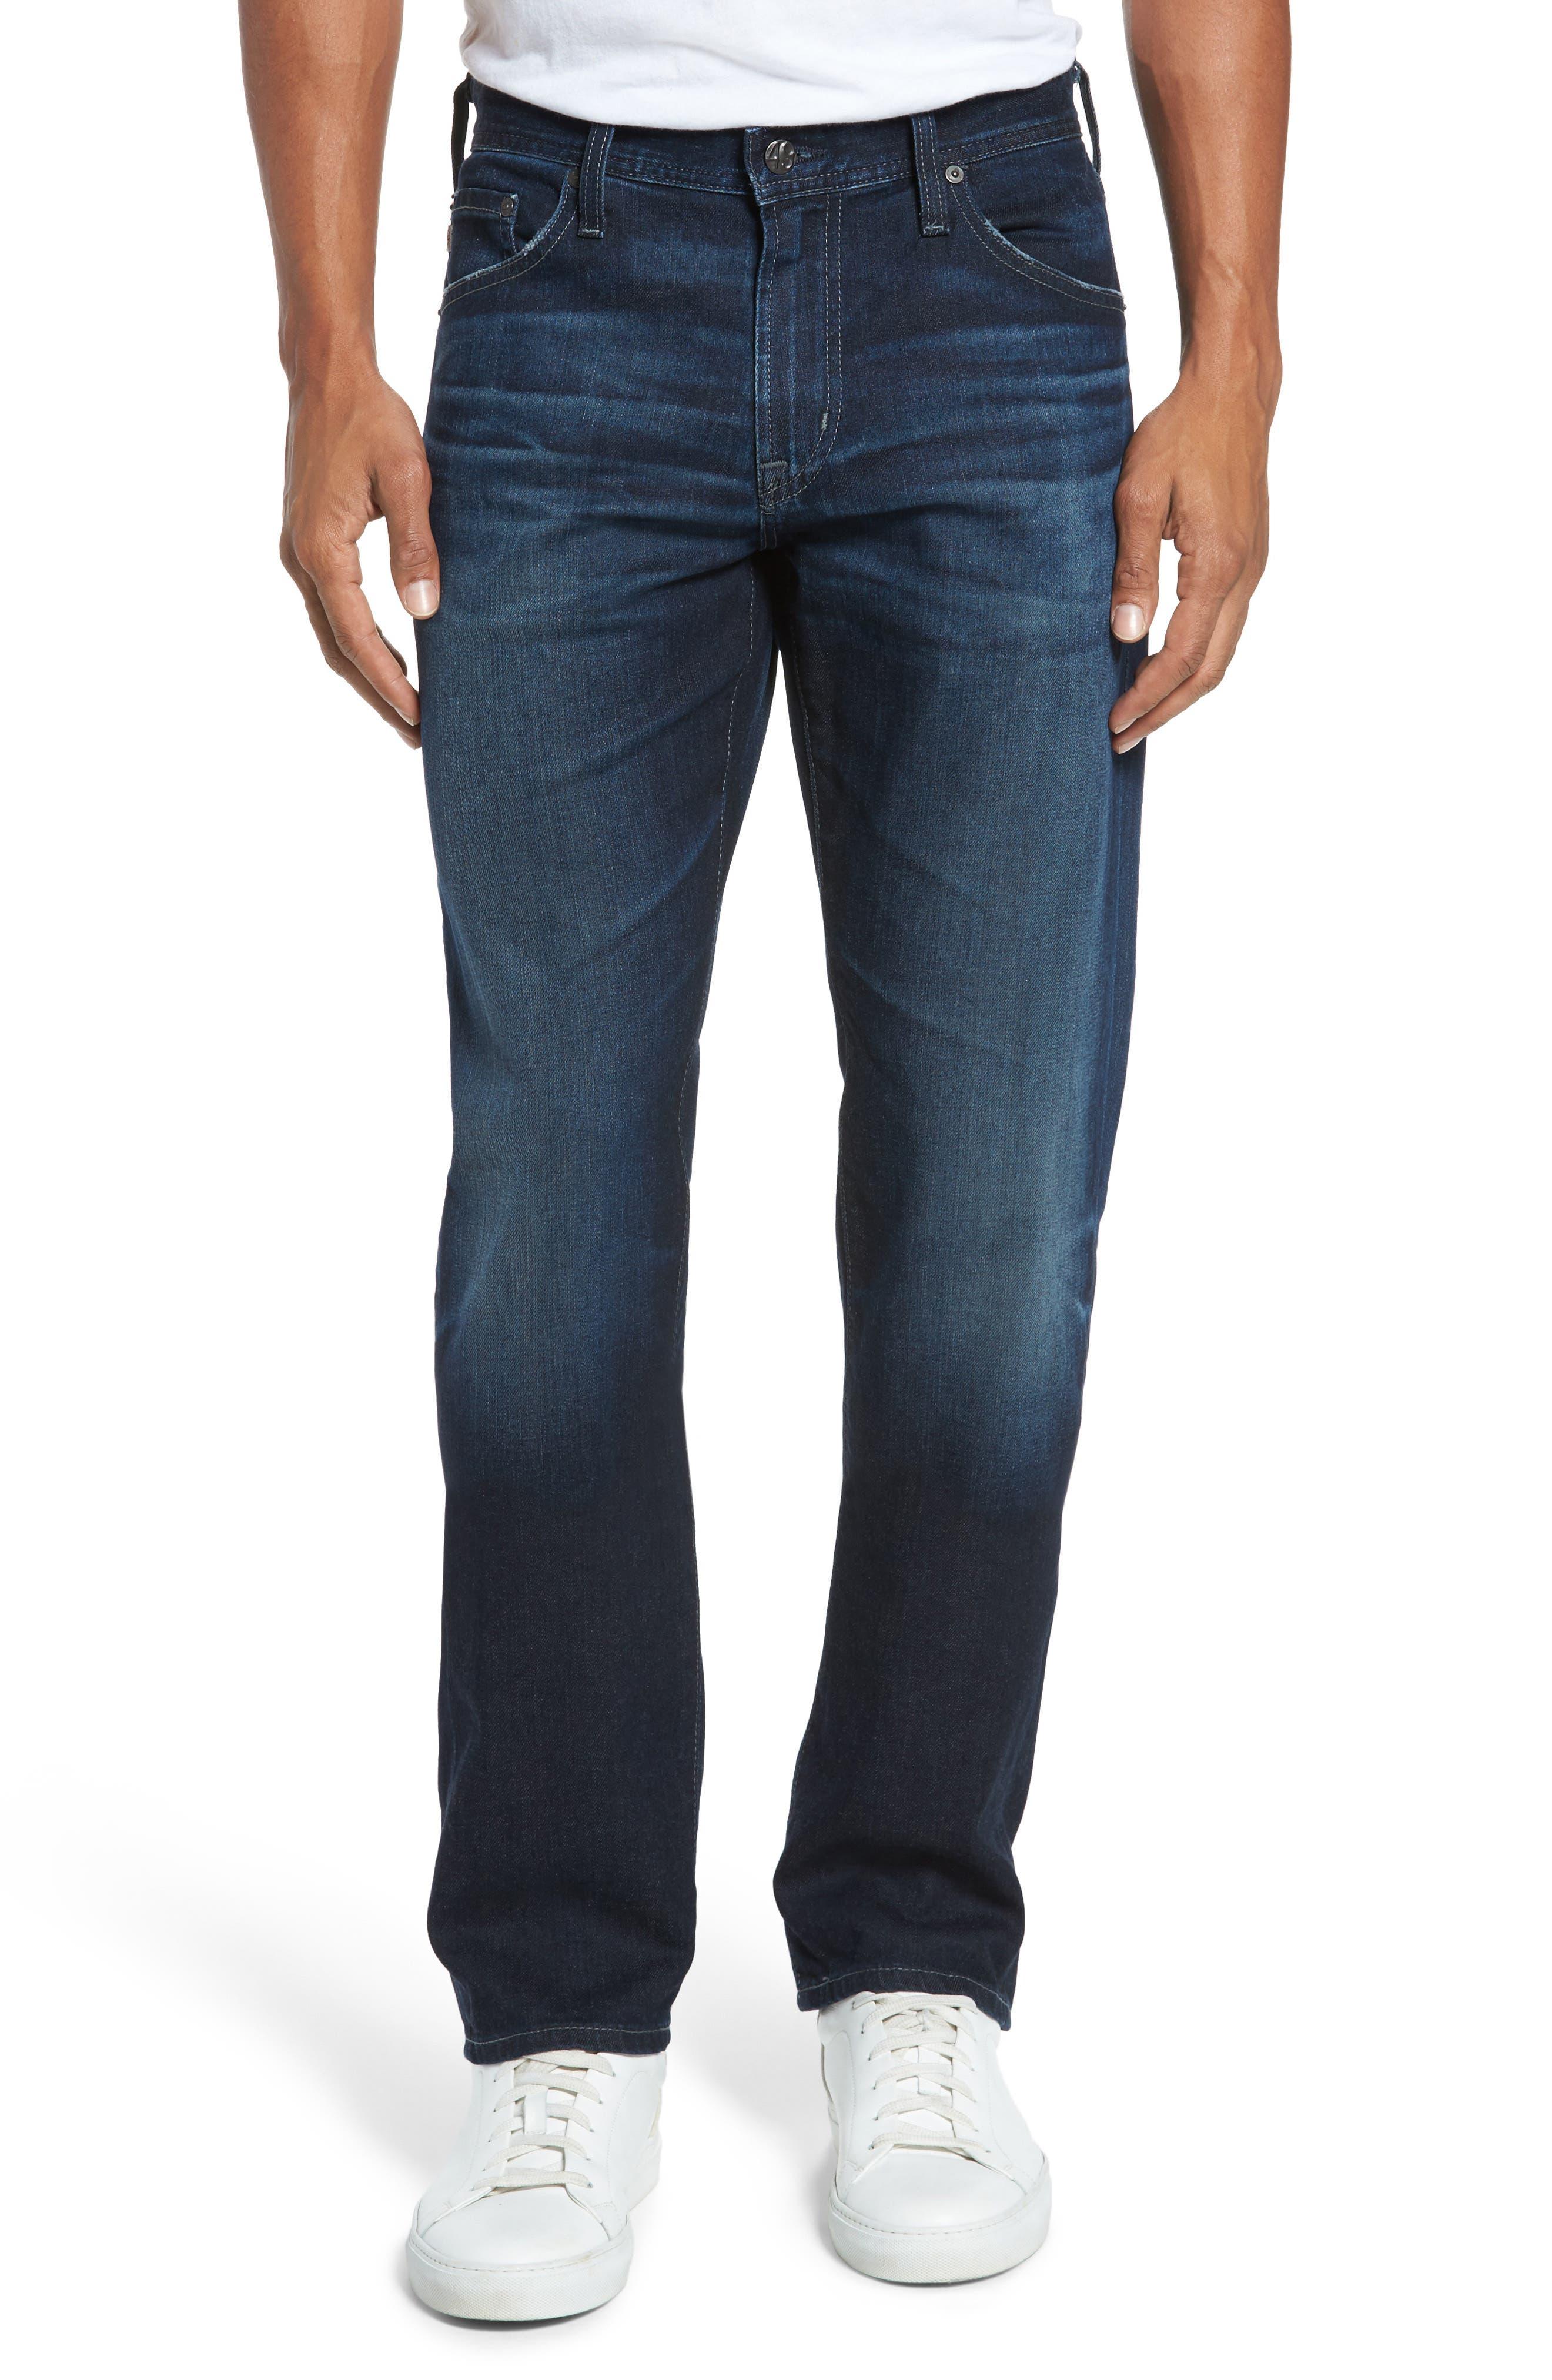 Graduate Slim Straight Fit Jeans,                         Main,                         color, 482